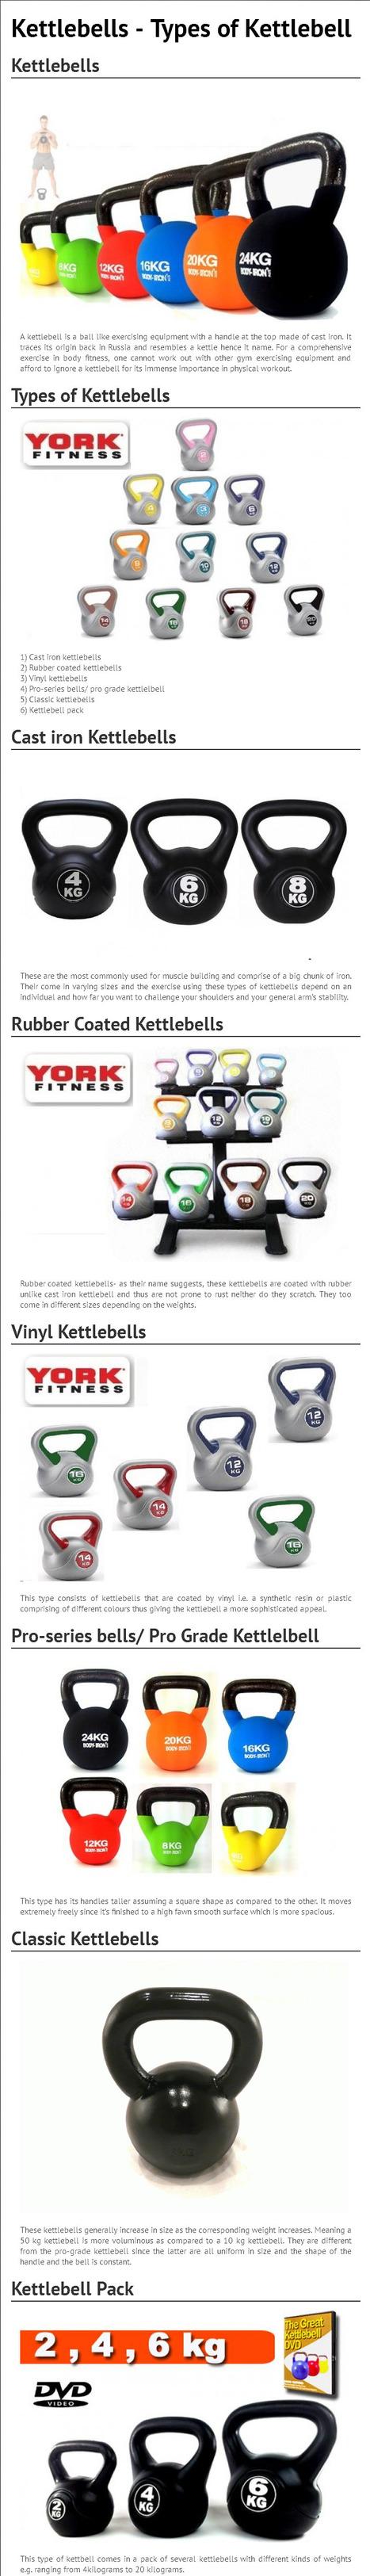 Kettlebells - Types of Kettlebells [INFOGRAPH]   worldfitness   Scoop.it